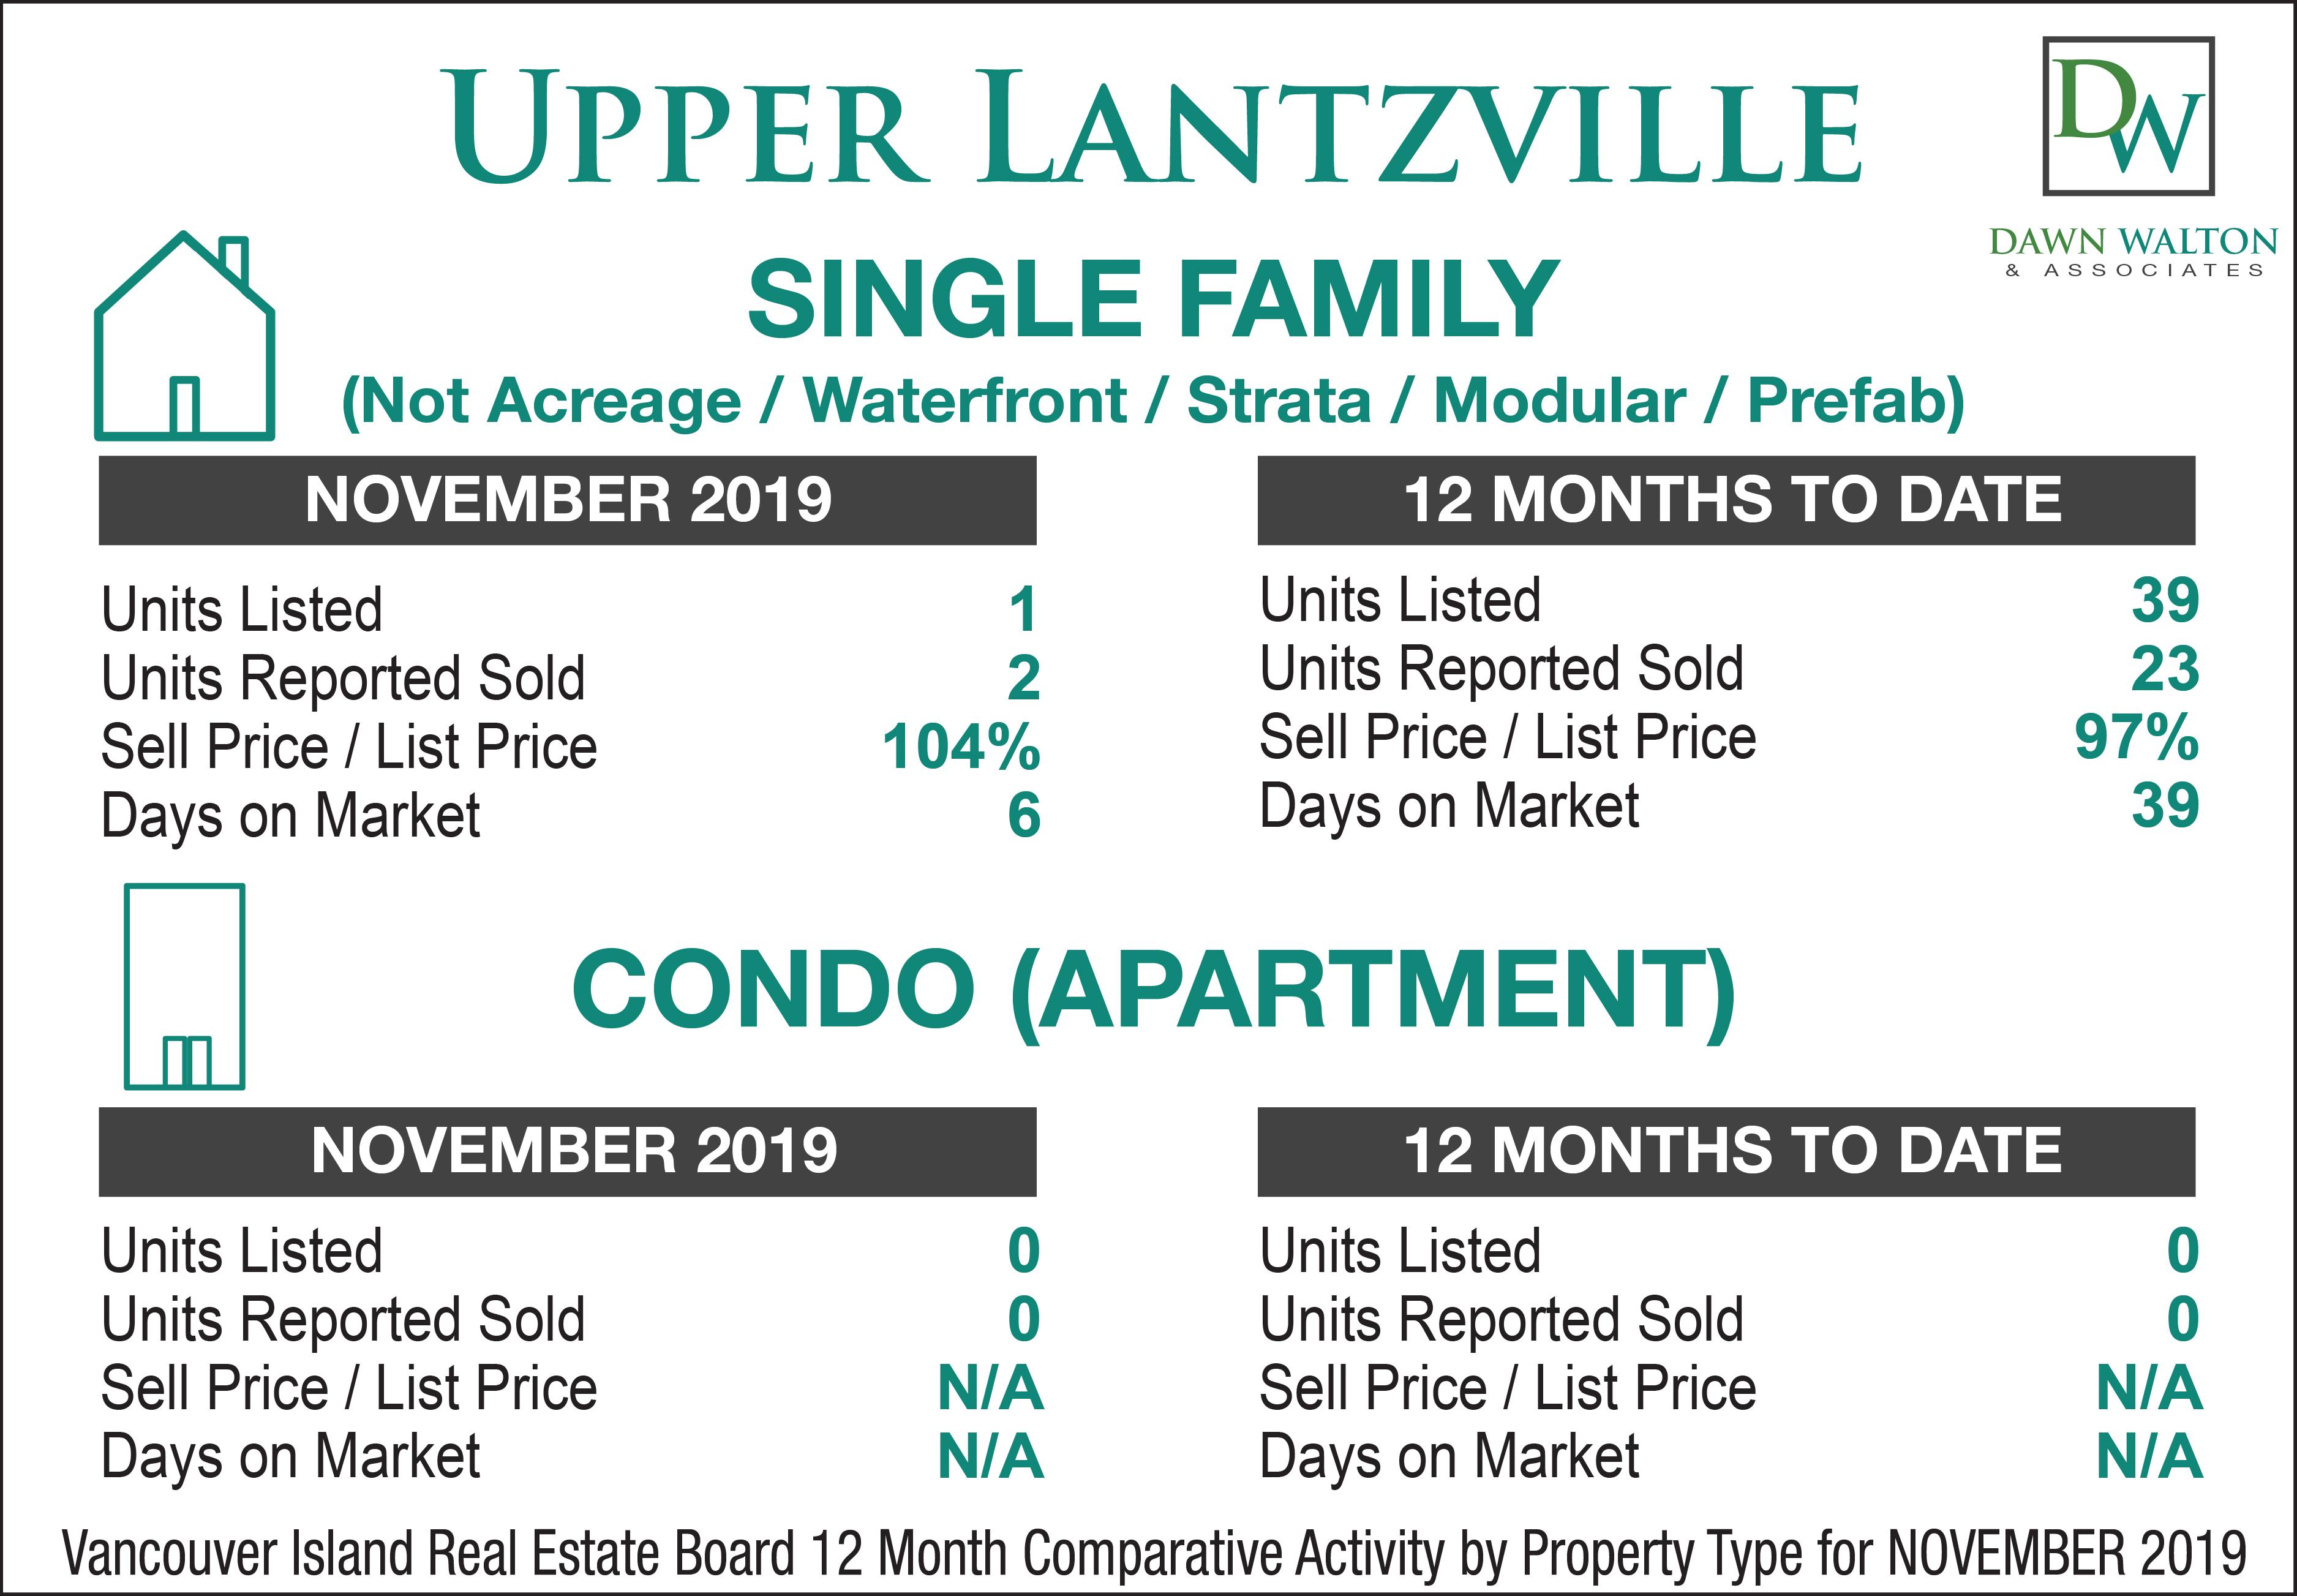 Upper Lantzville Real Estate Market Stats November  2019 - Nanaimo Realtor Dawn Walton